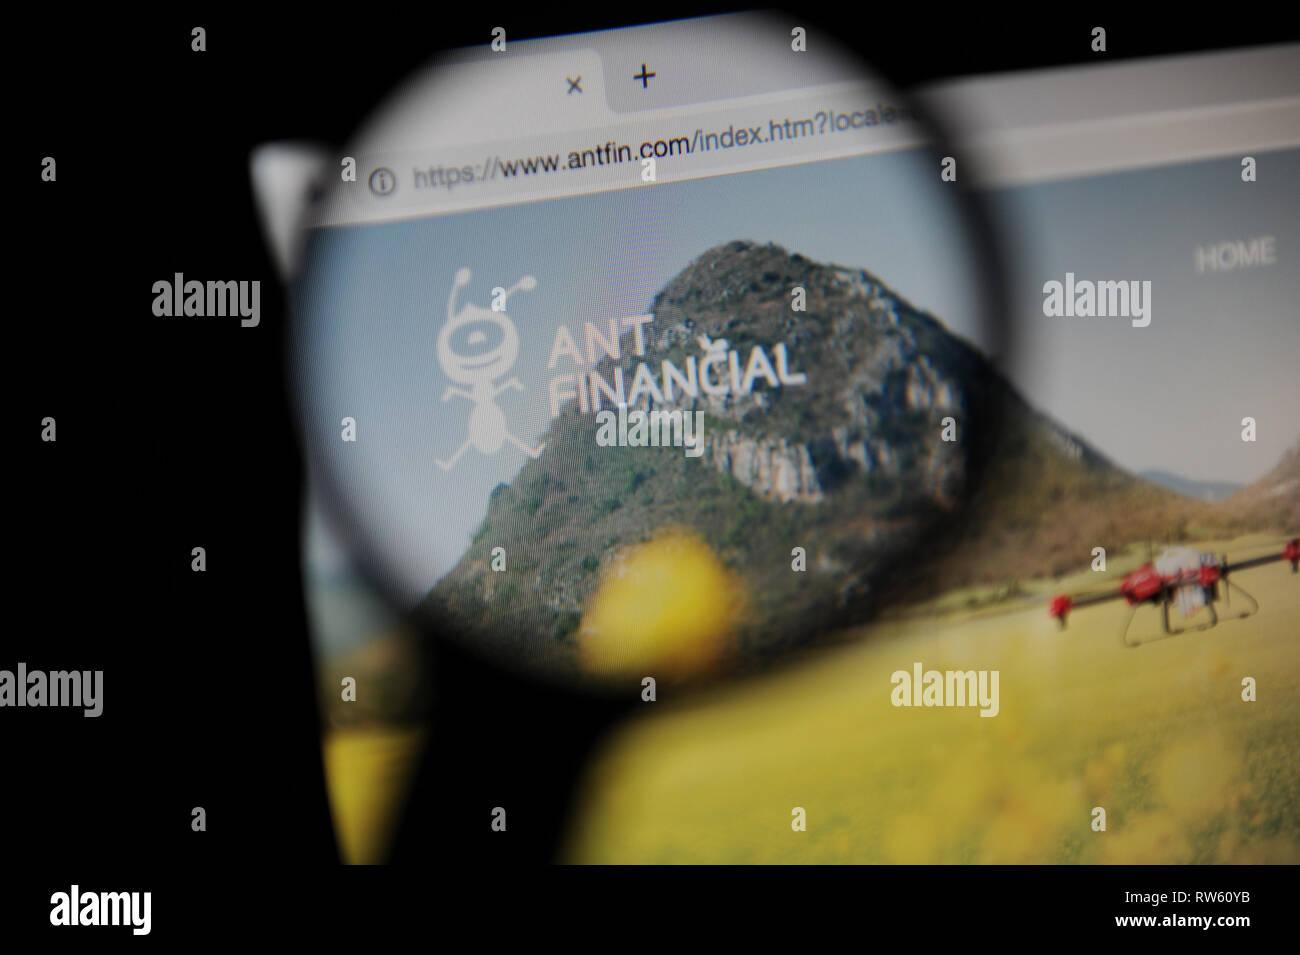 Alibaba Stock Photos & Alibaba Stock Images - Alamy